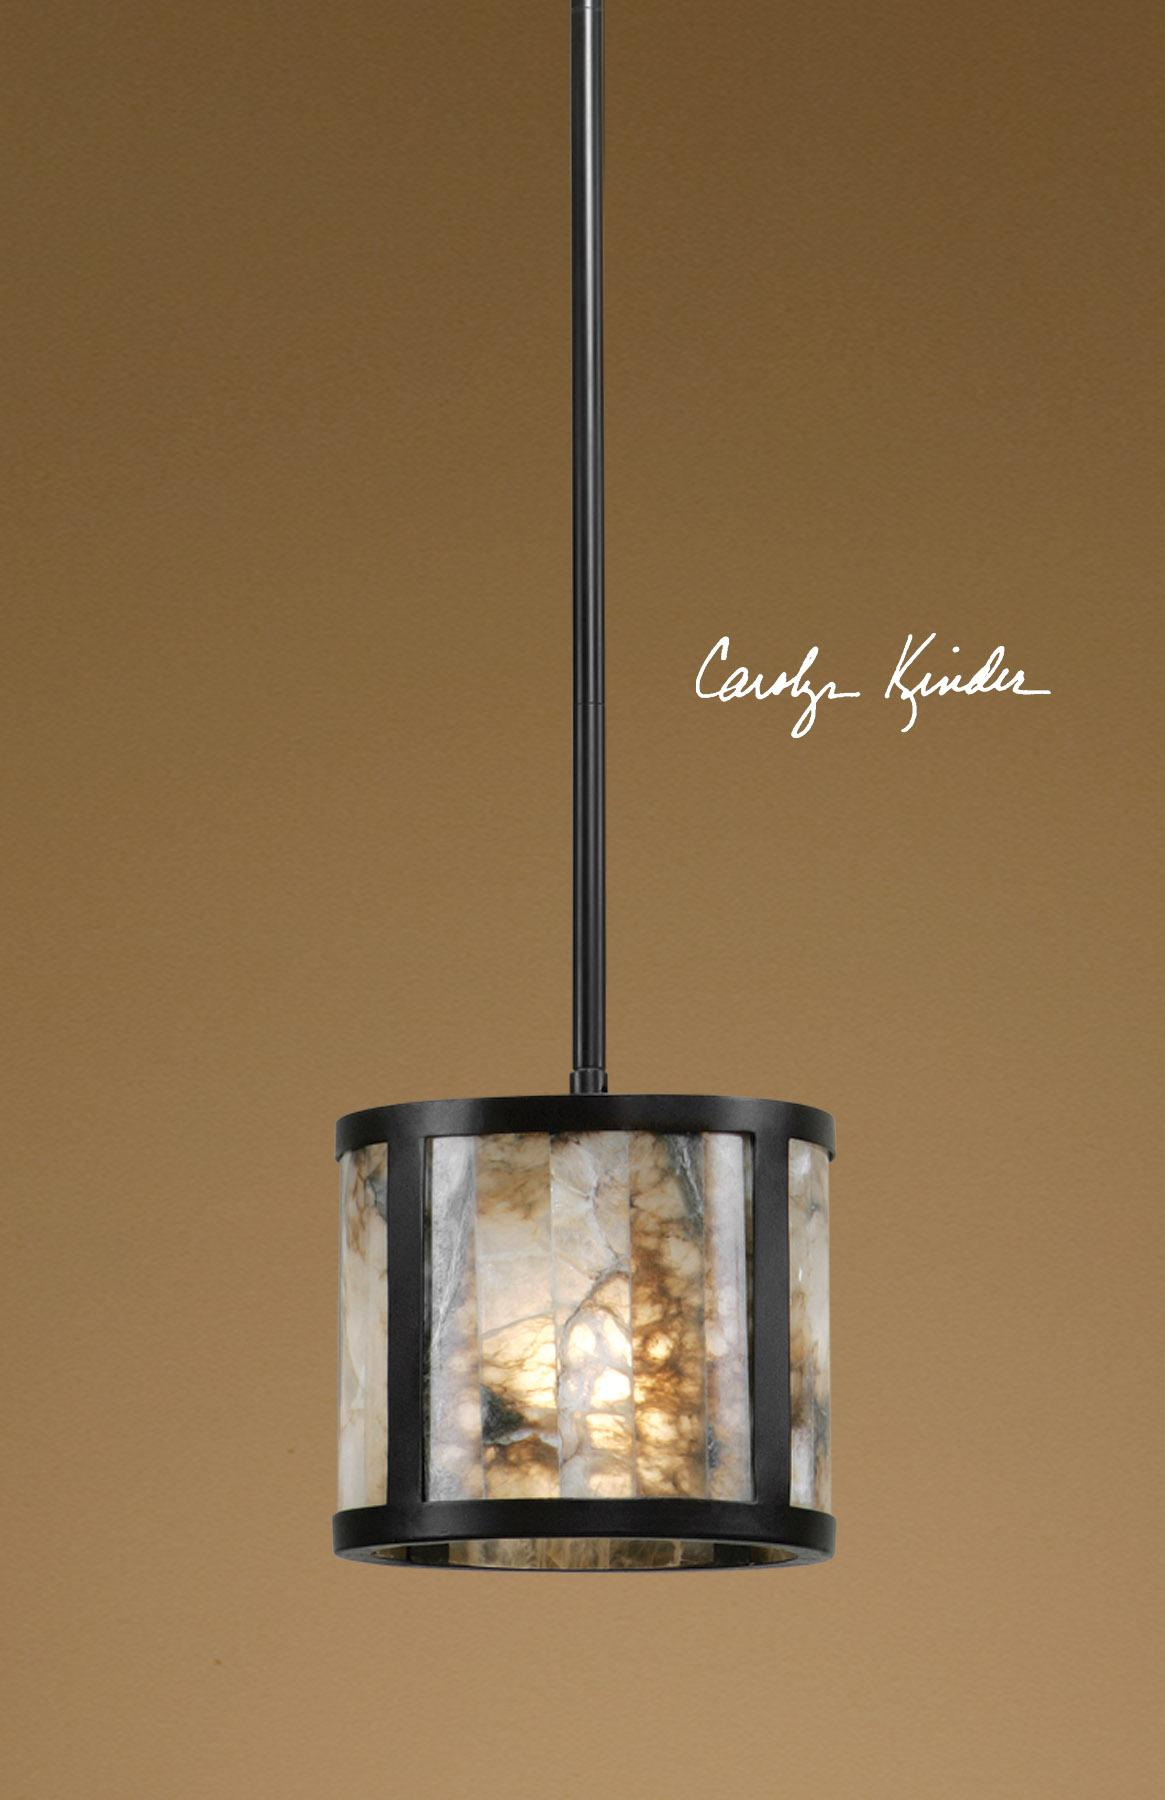 Uttermost Lighting Fixtures Coslada 1 Light Mini Pendant - Item Number: 21952